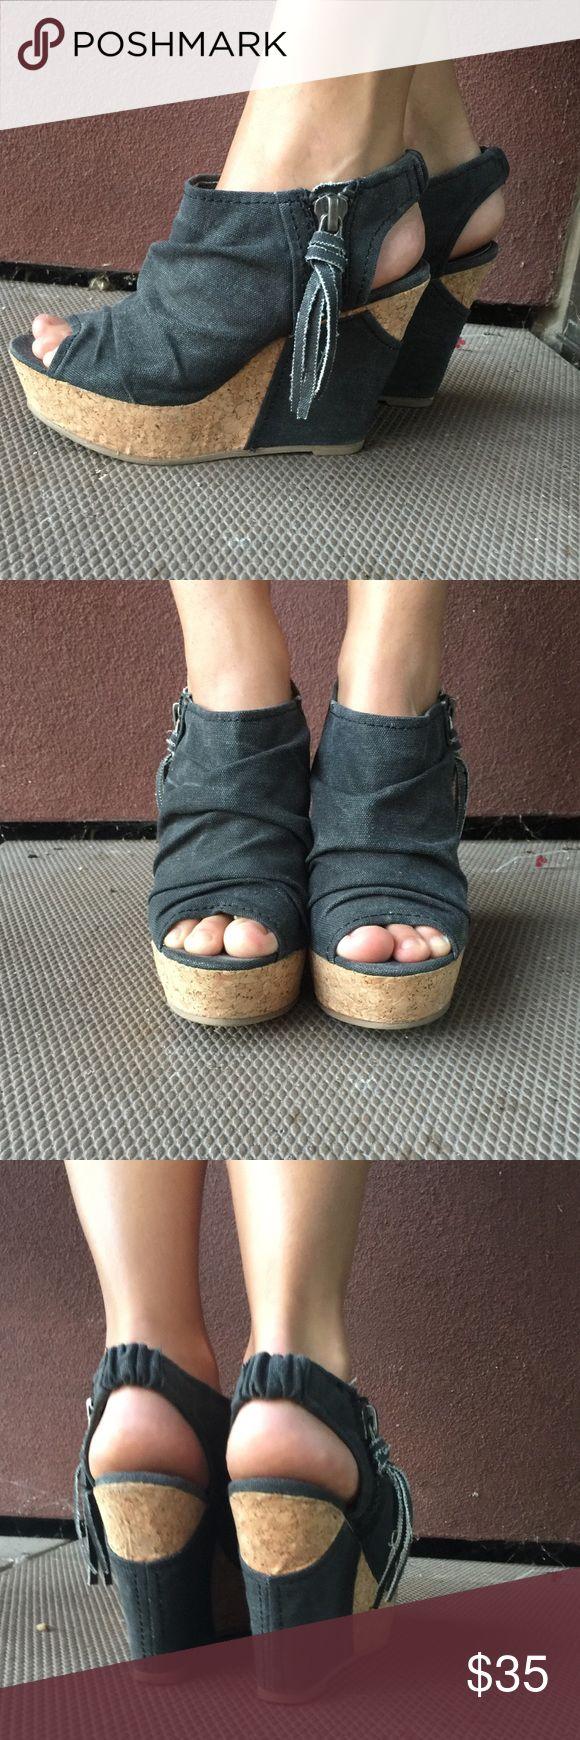 Wedges Black denim cork wedges with side zipper. Open toe. Hardly worn. Big Buddha Shoes Wedges